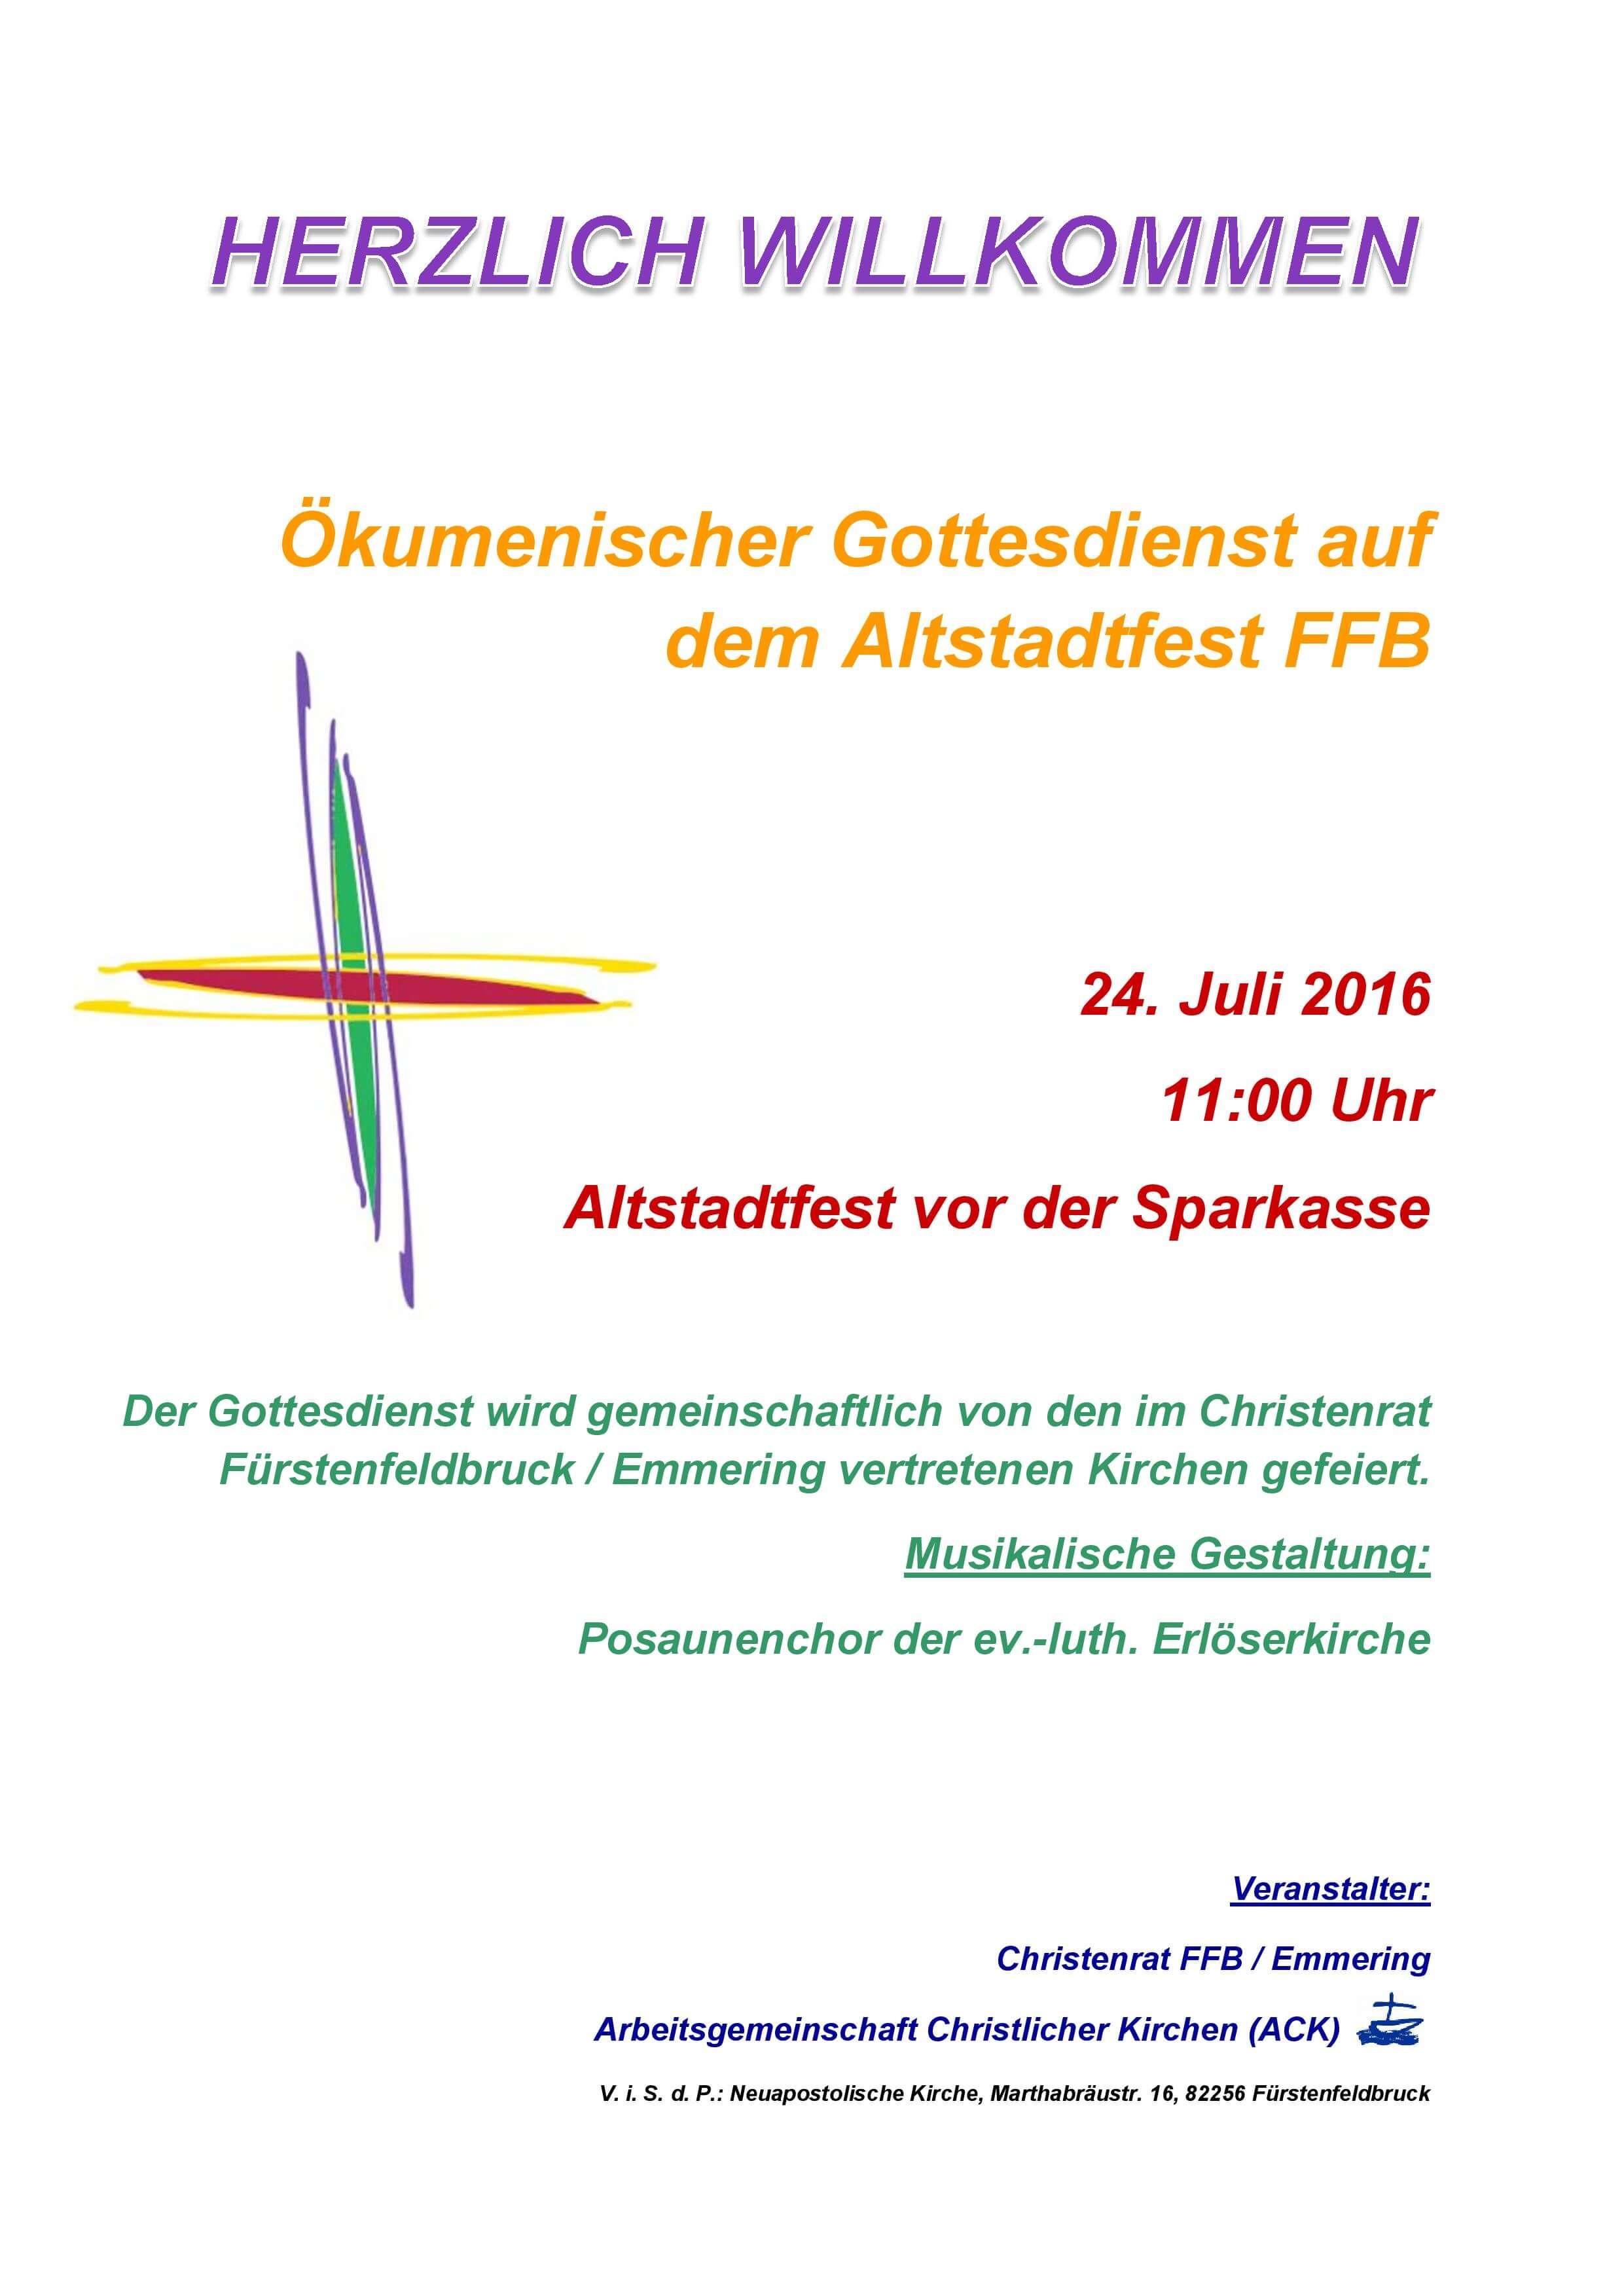 Plakat-Altstadtfest-GD-page-001